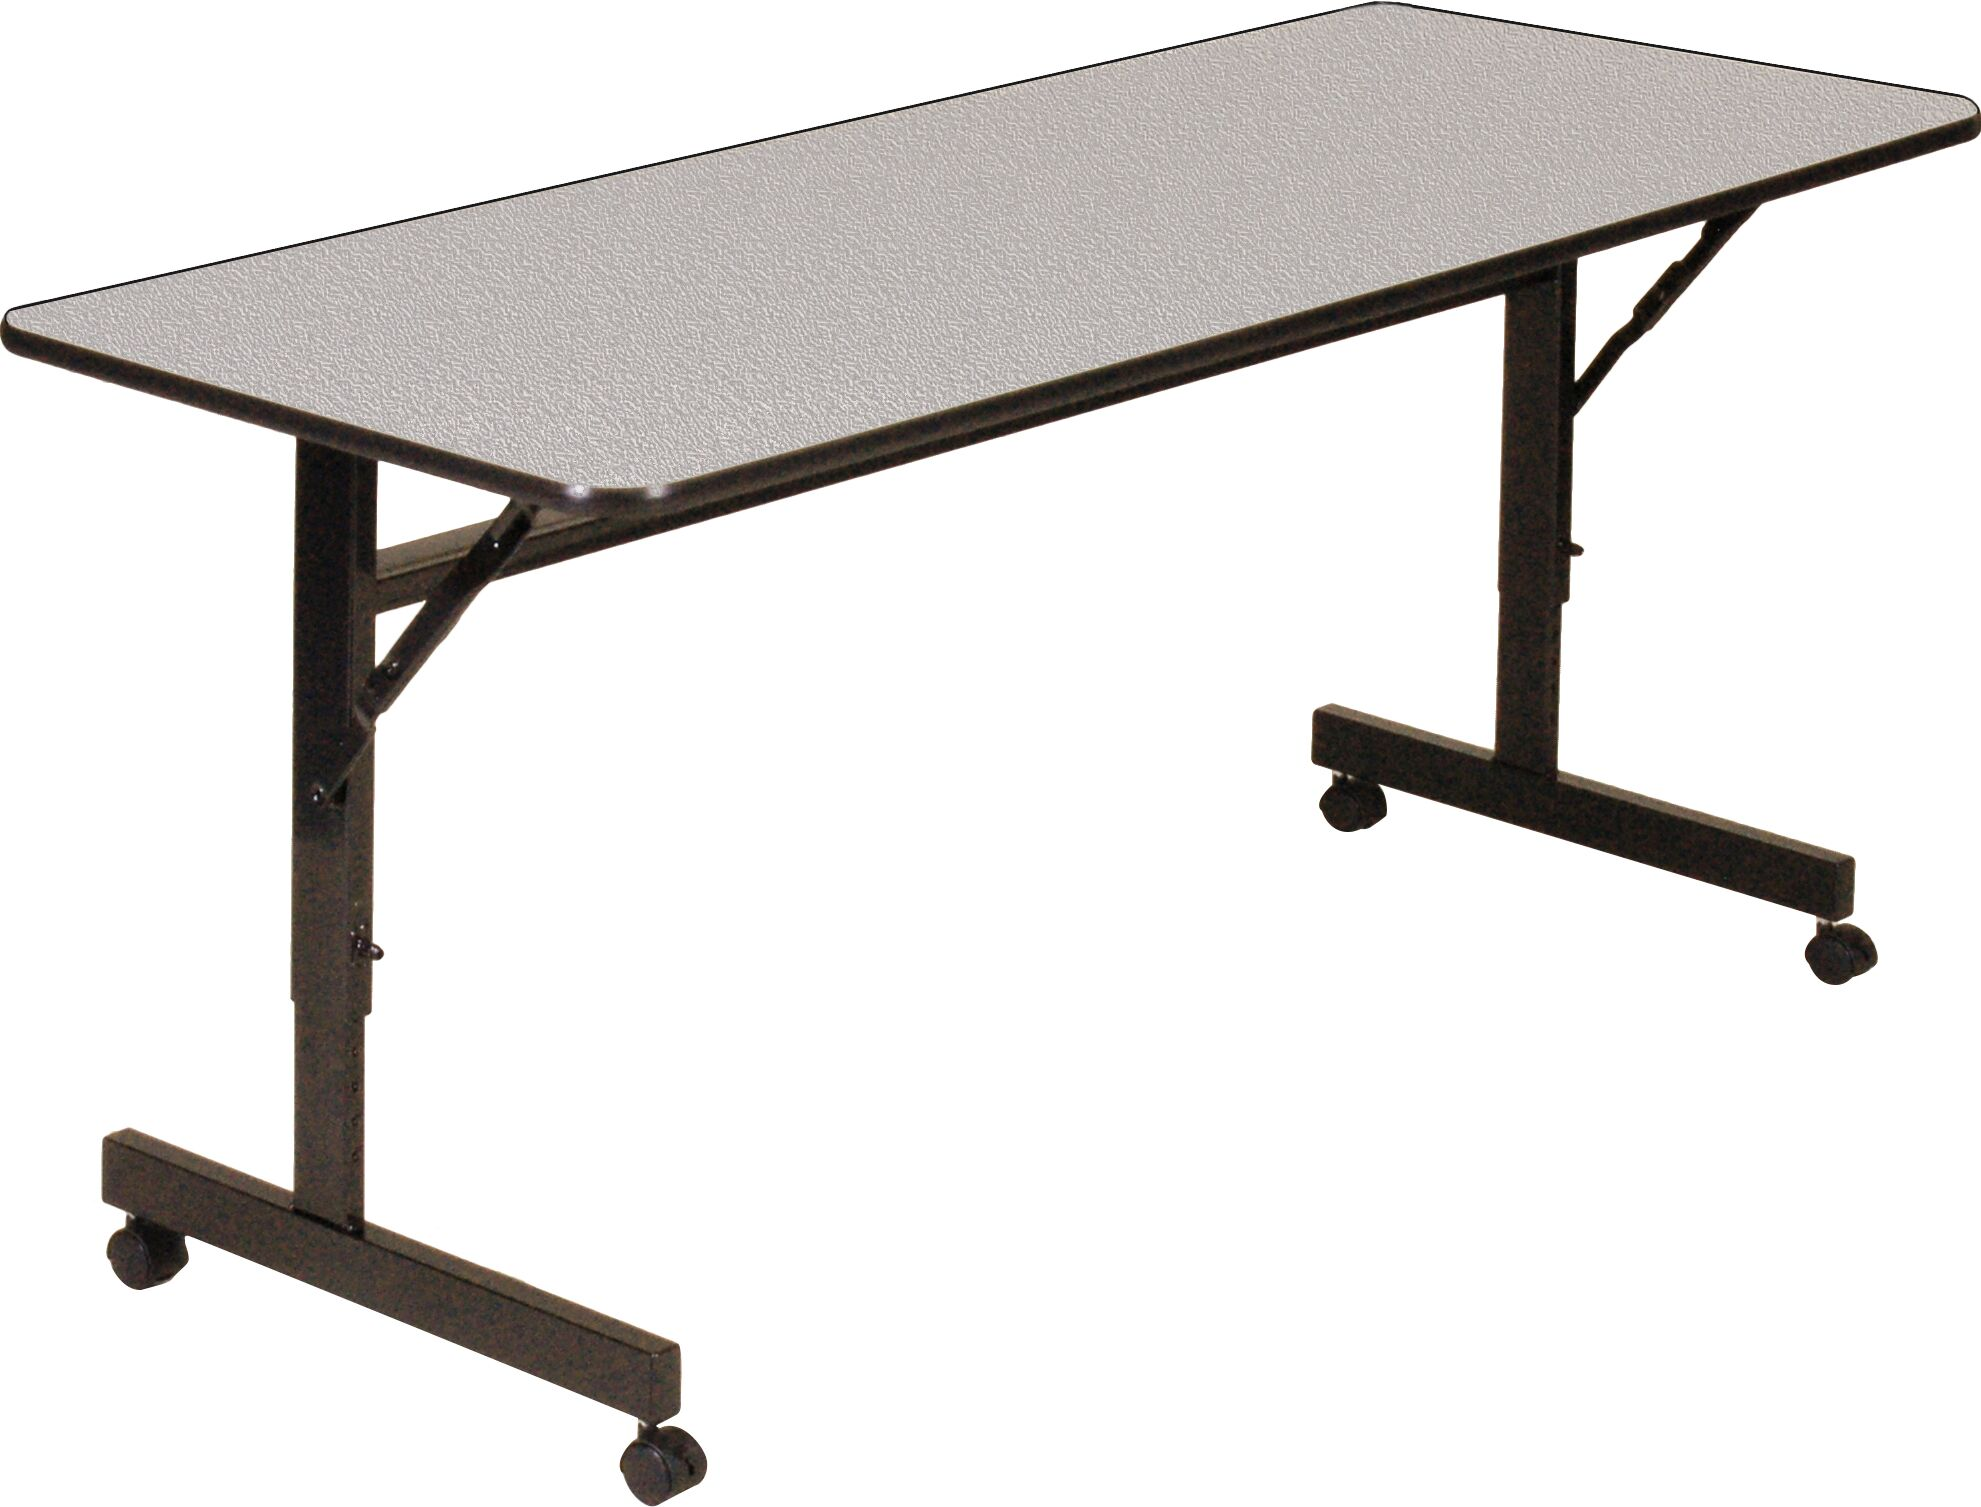 Borchert Training Table with Wheels Width: 48